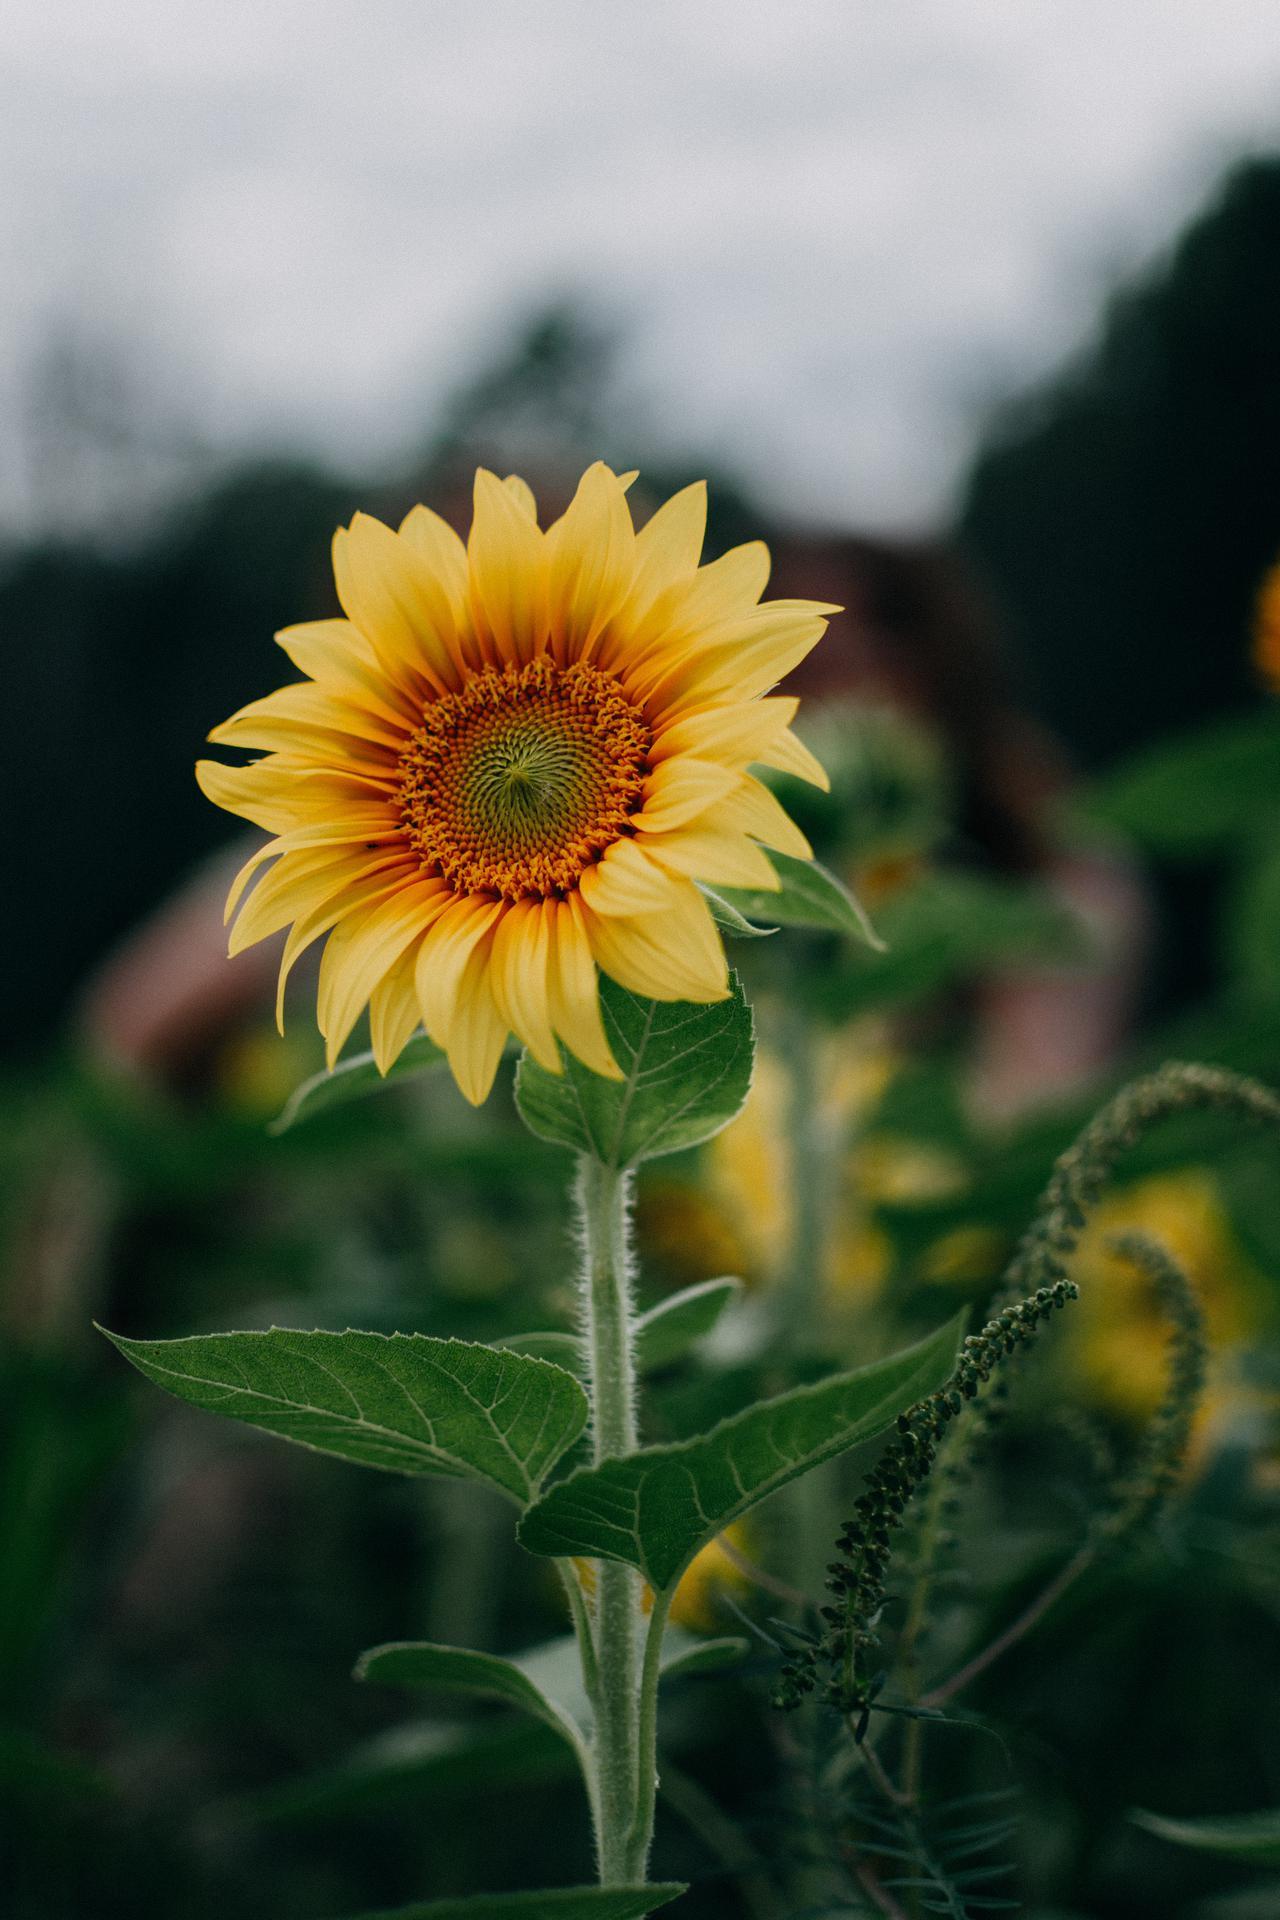 sunflower-selective-focus-photography-1366630.jpg